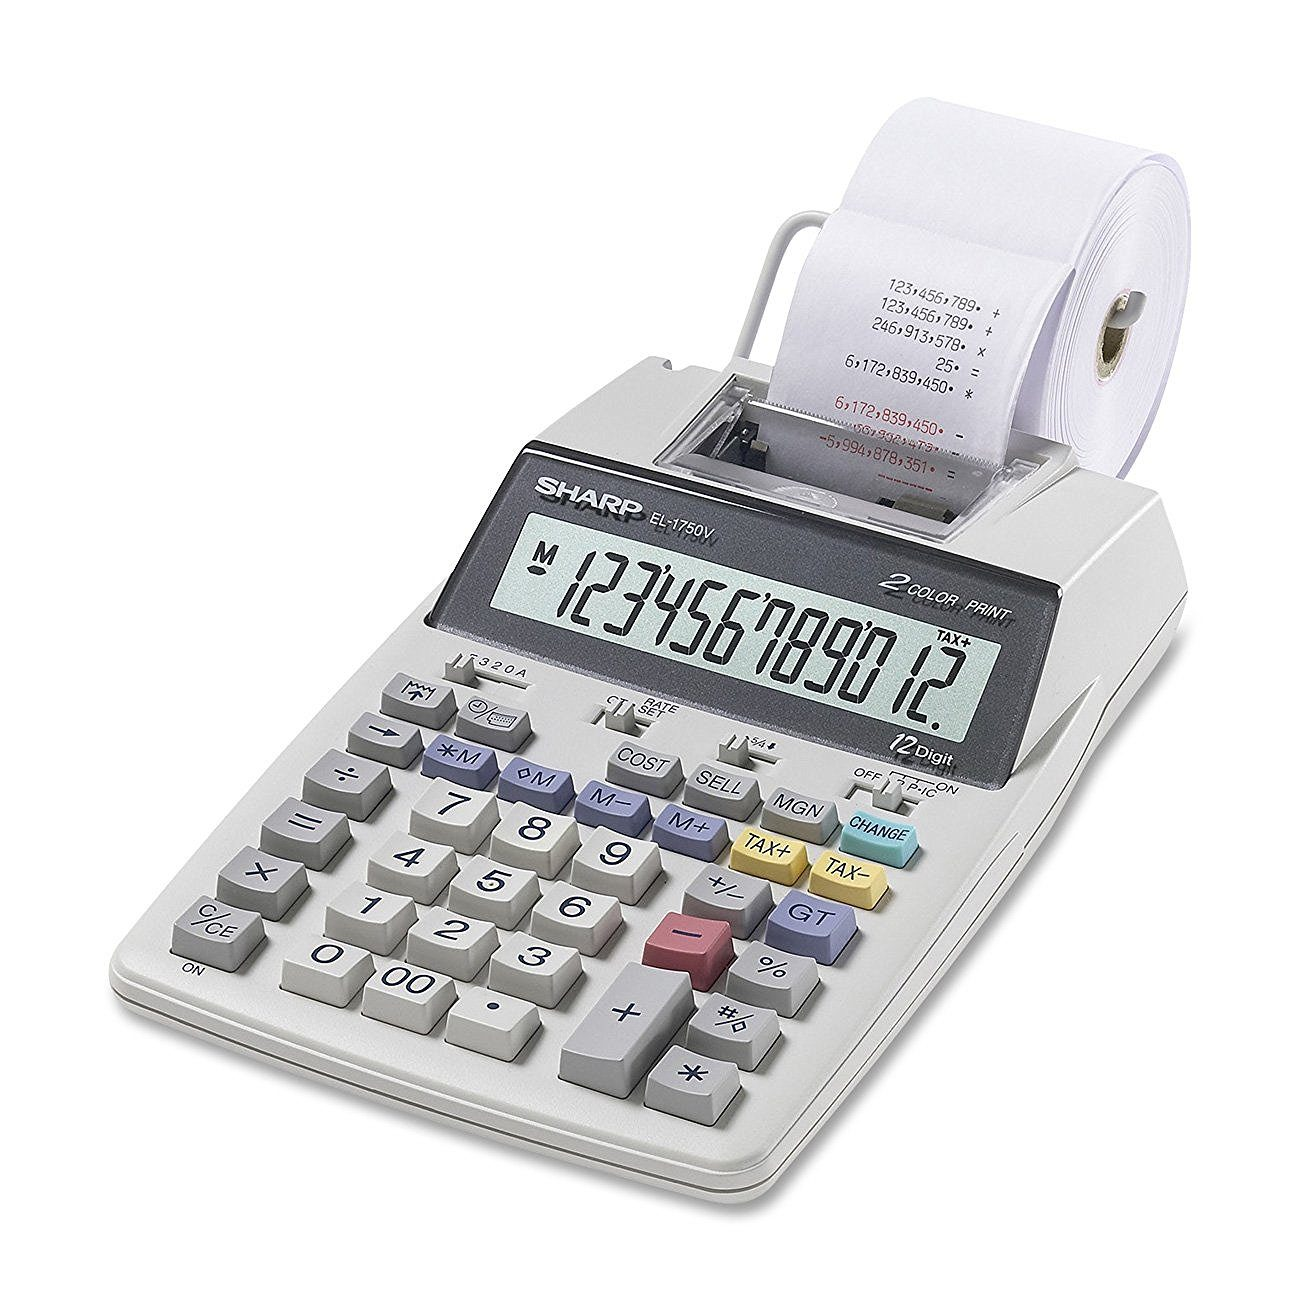 Casio HR8TM Handheld Printing Calculator 12 Character s - LCD AC Supply Power